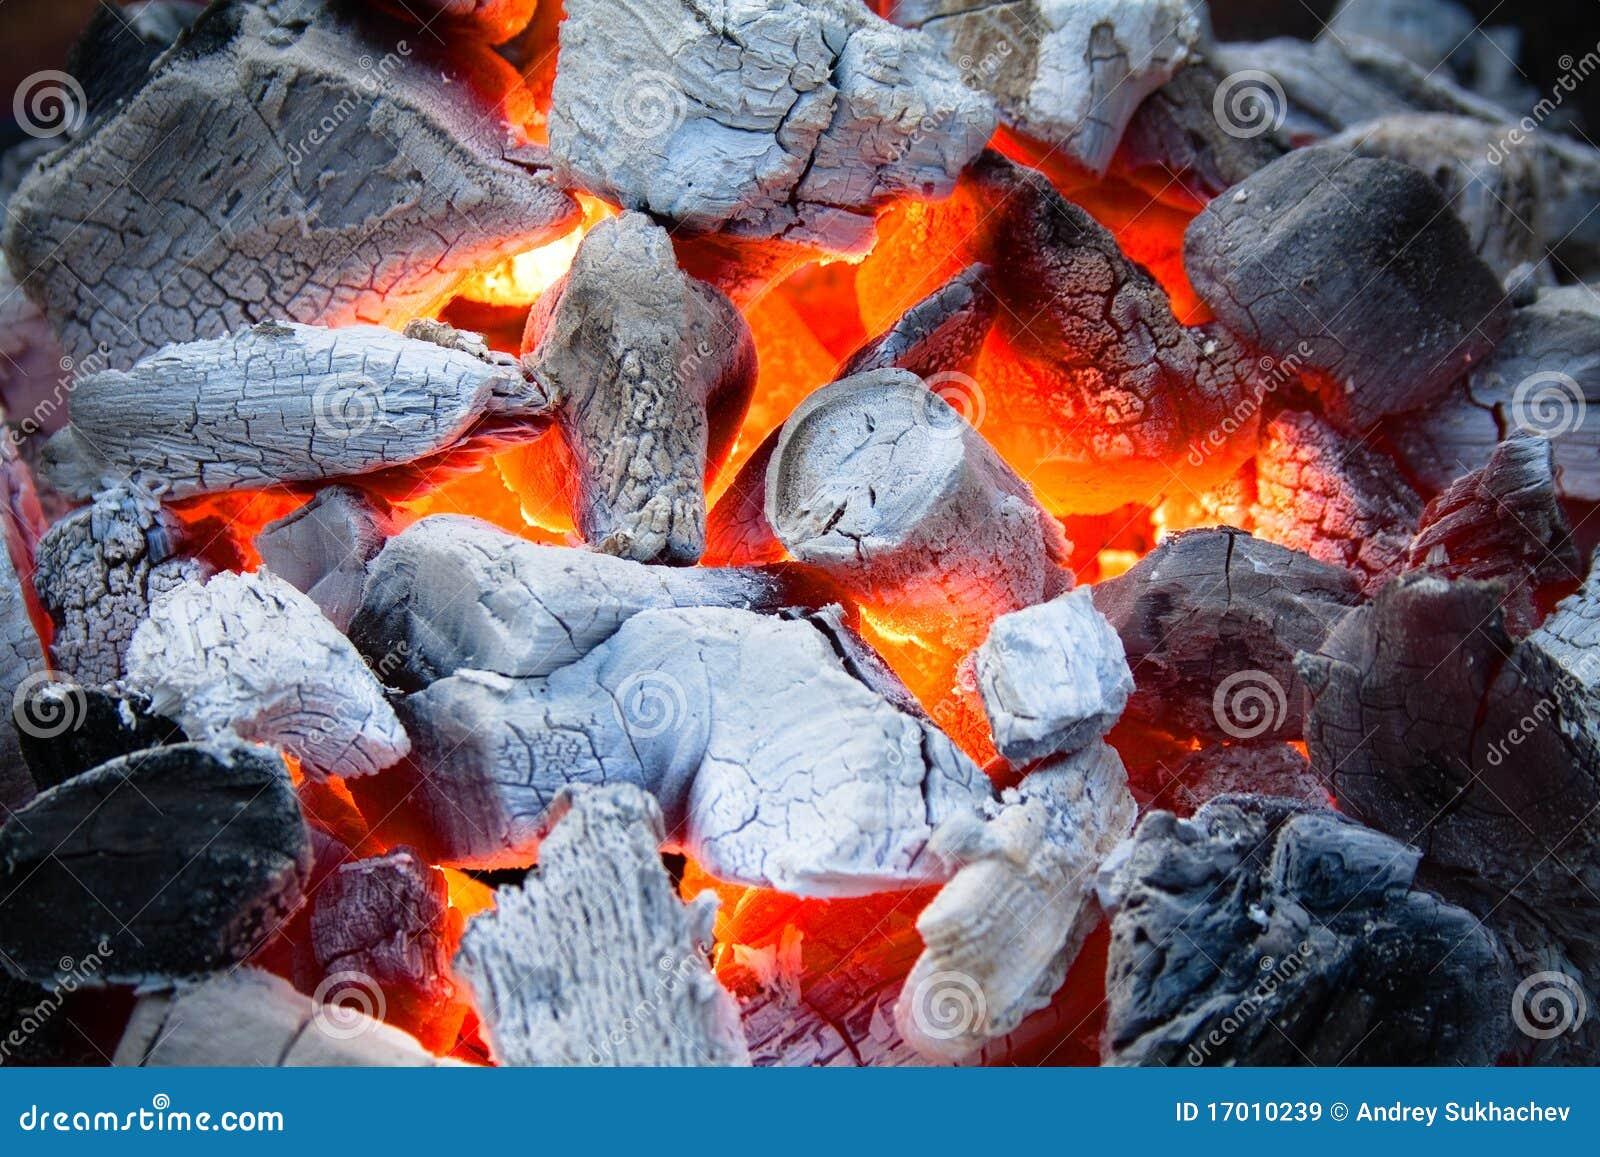 burning coal royalty free stock images image 17010239 hookah vector illustration hookah vector free